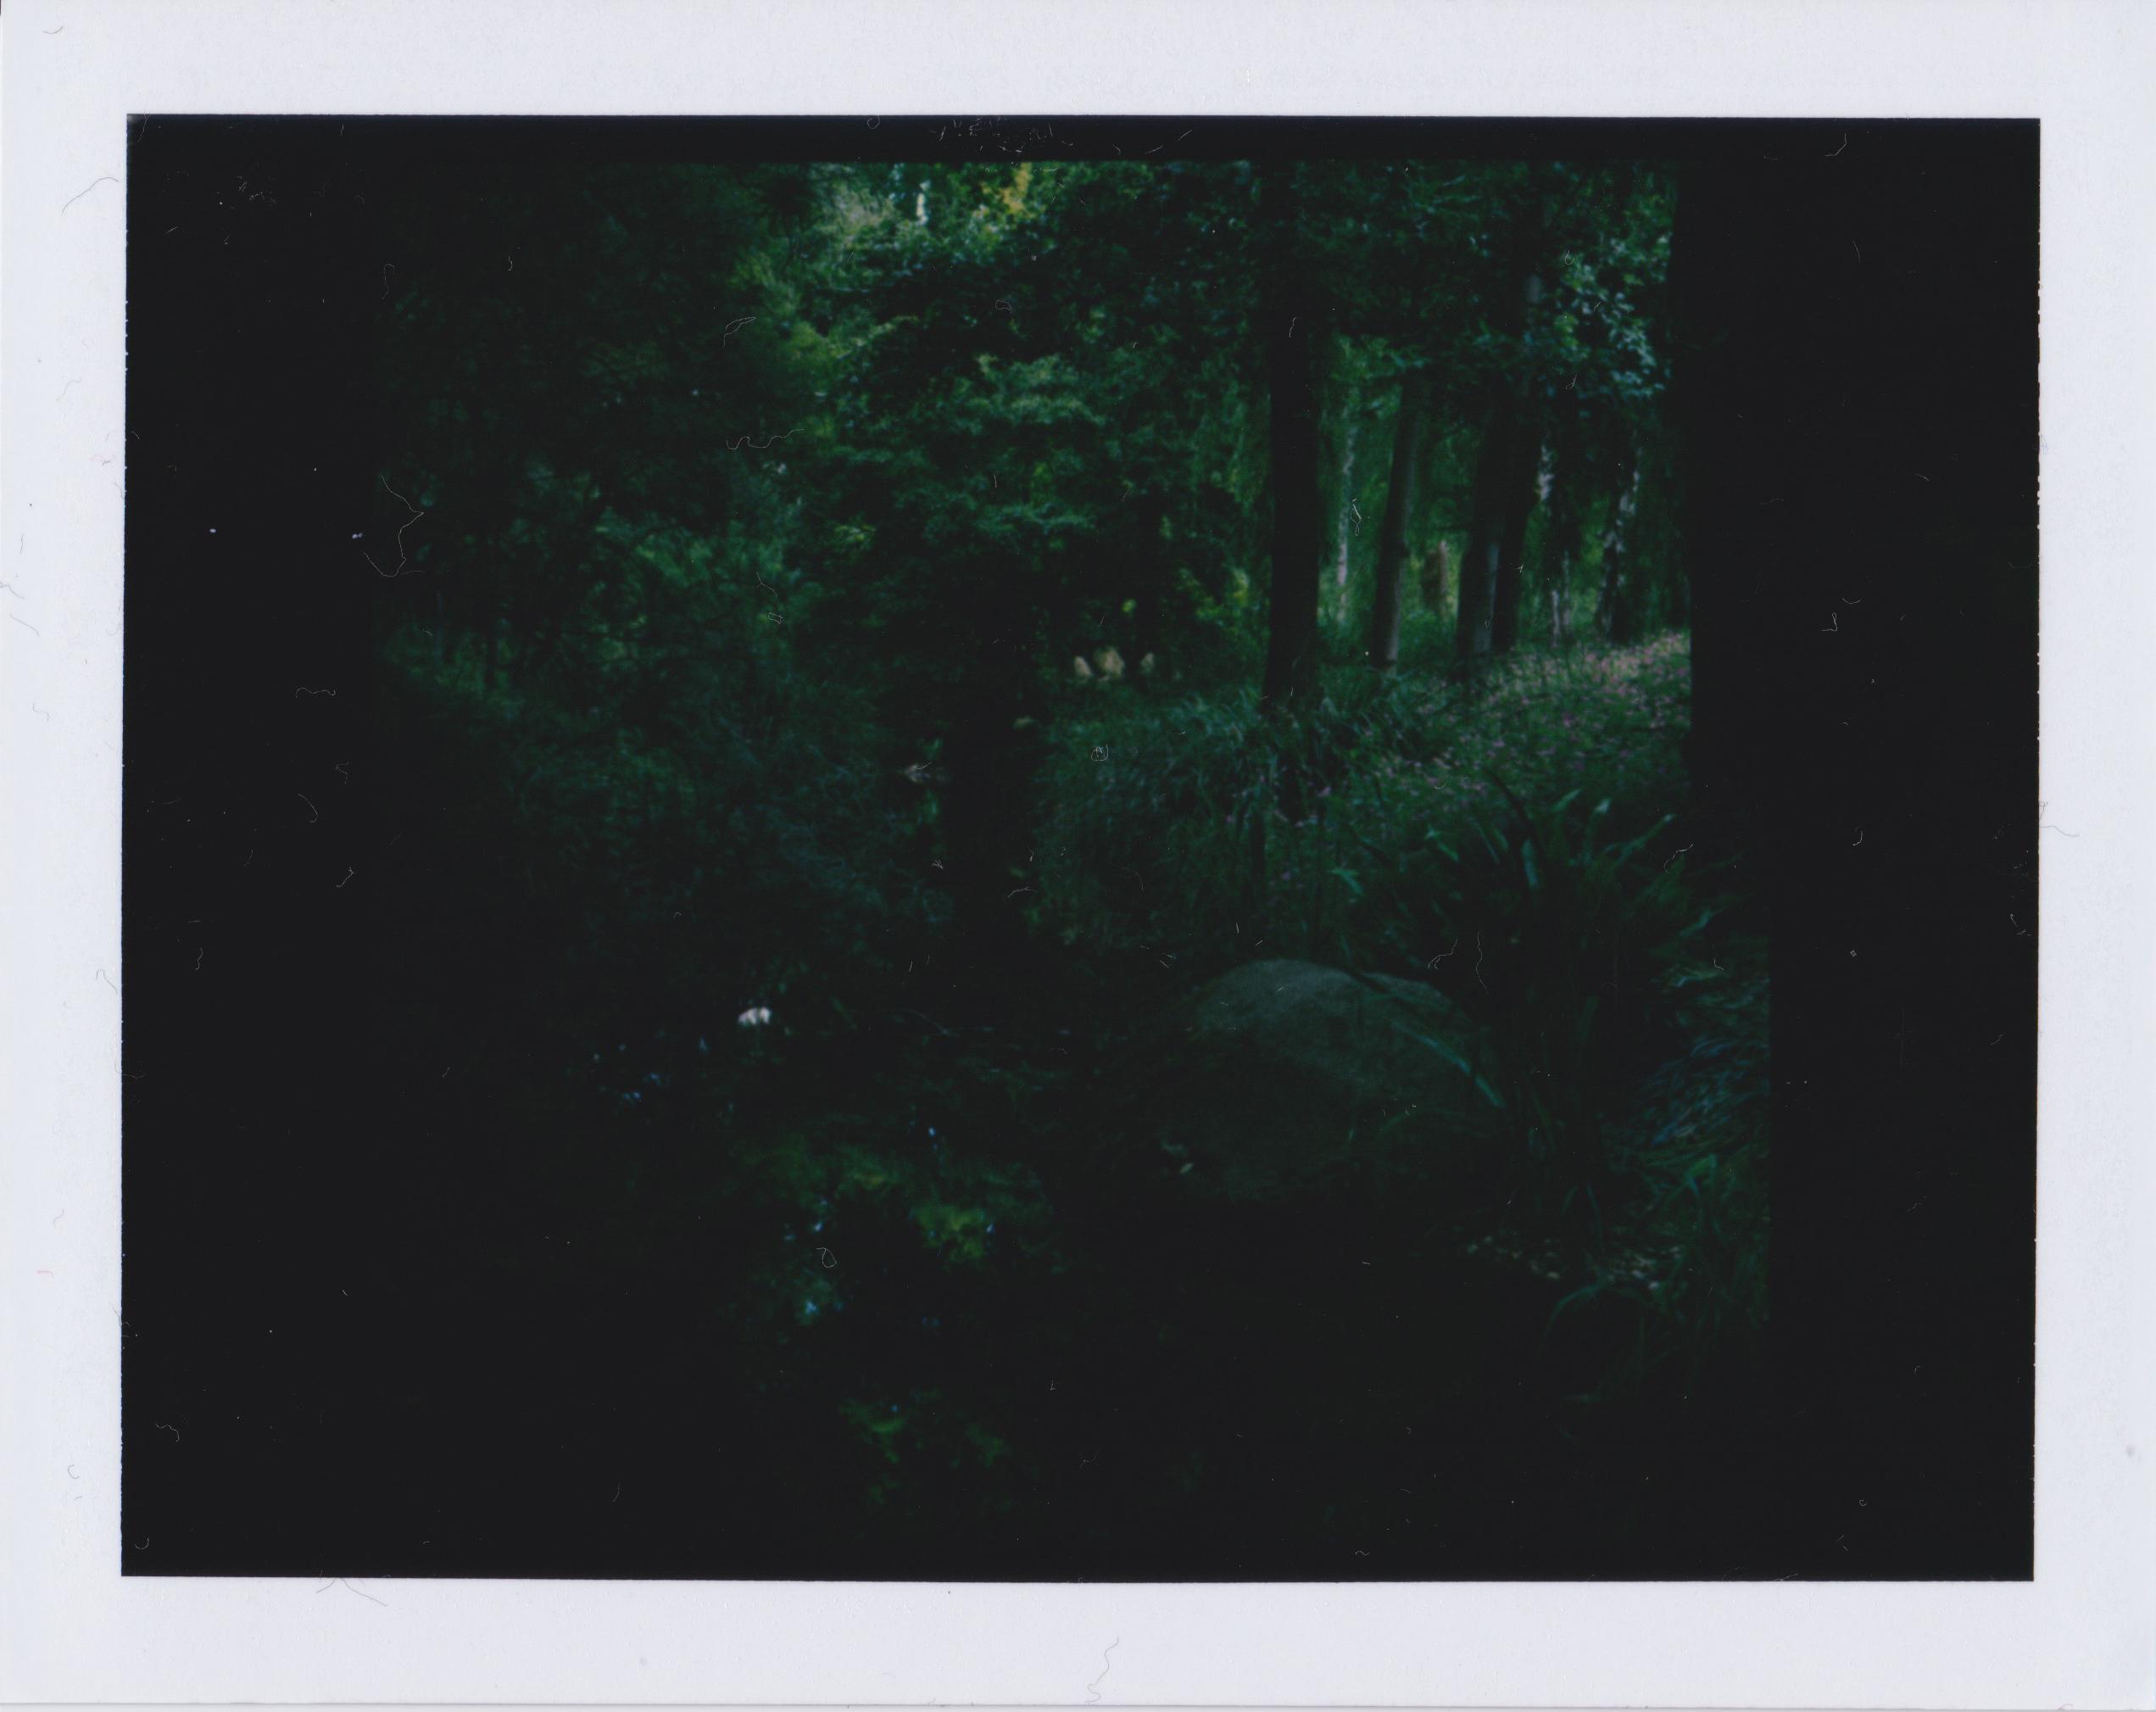 Luisenpark Mannheim Polaroid 4